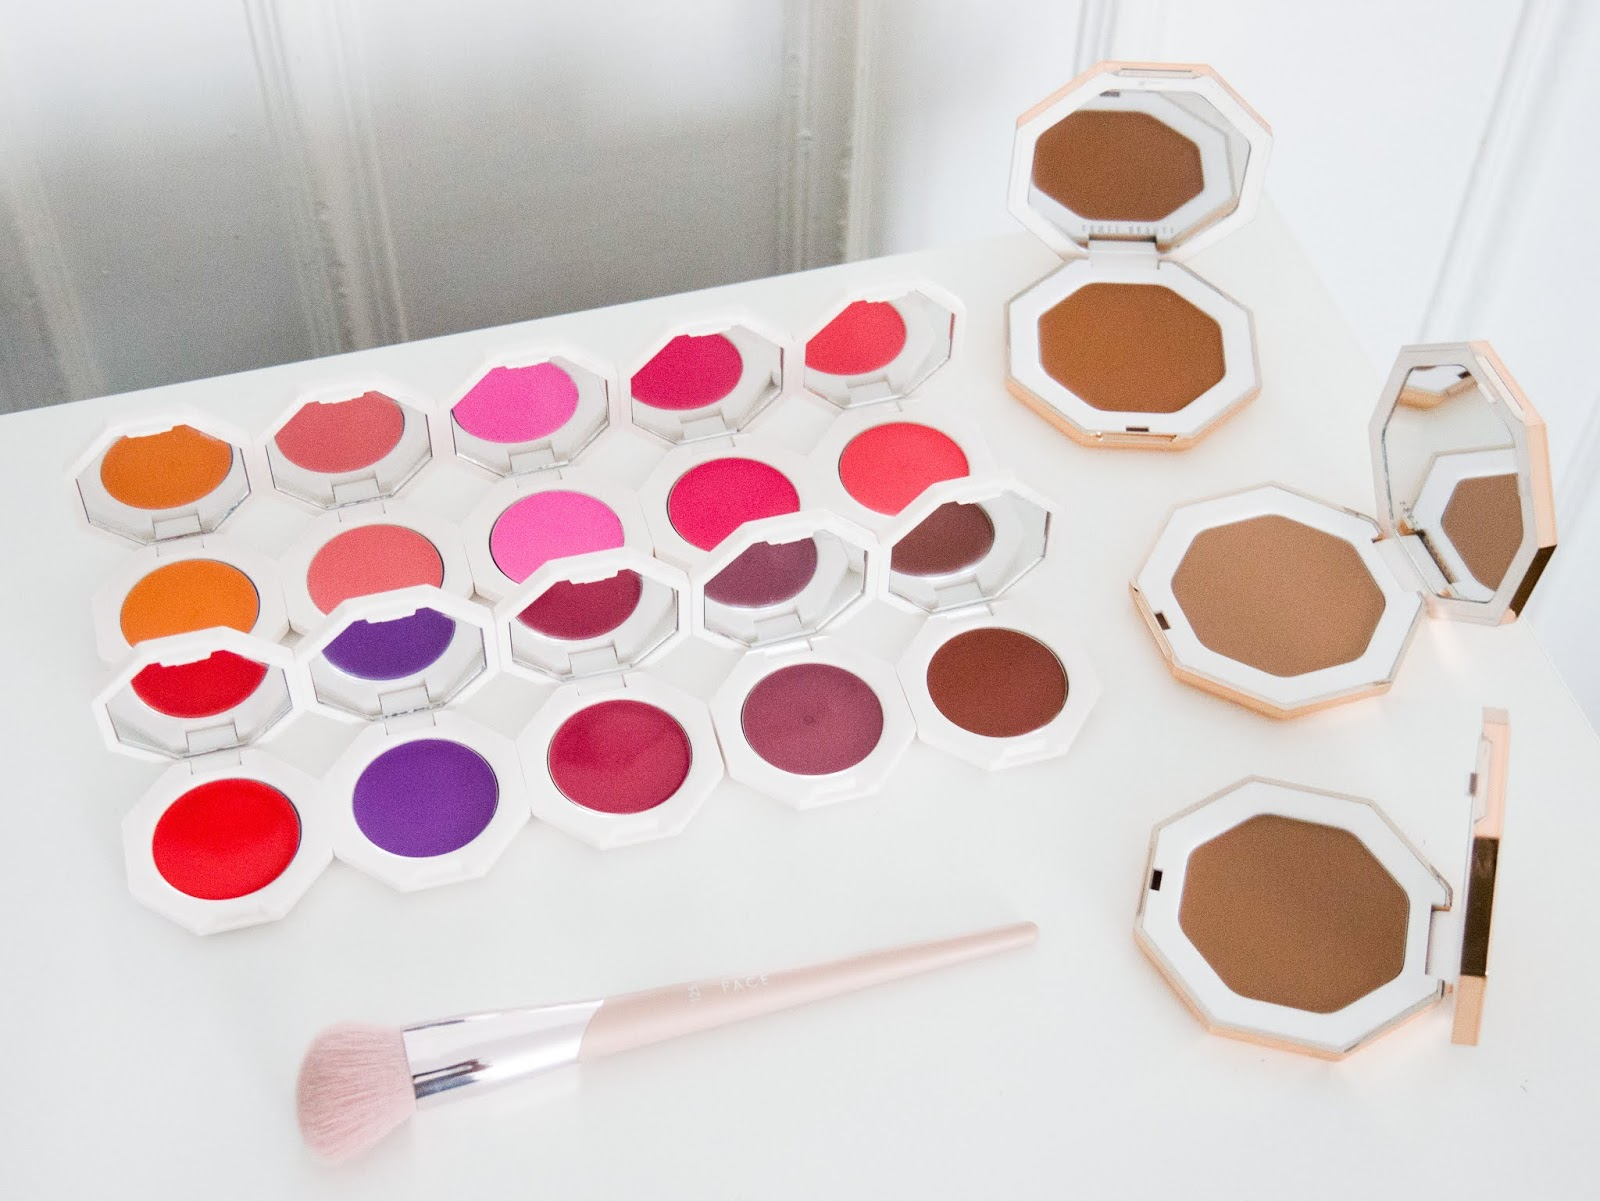 Cheeks out freestyle cream blush & bronzer de Fenty Beauty